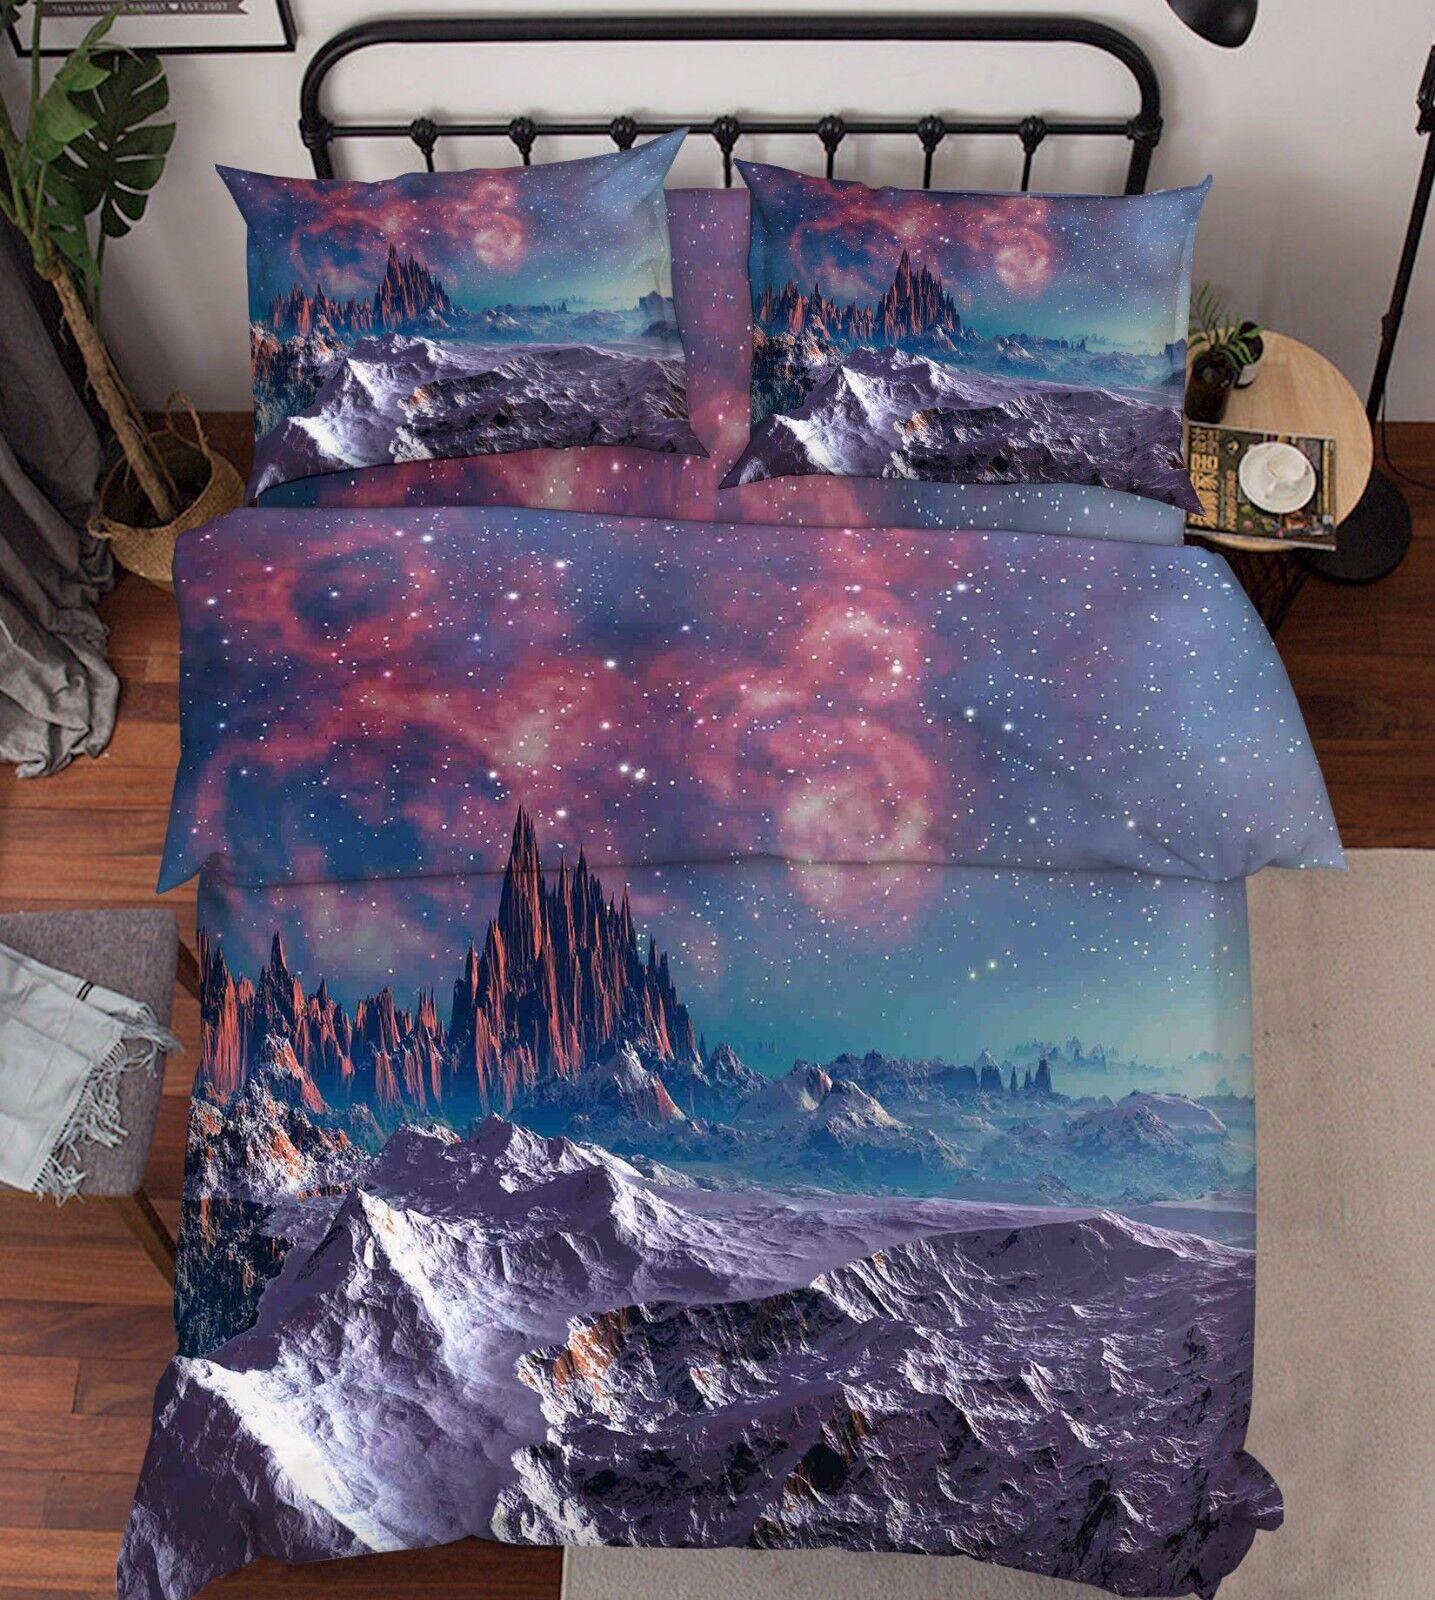 3D Space Hills 816 Bed Pillowcases Quilt Duvet Cover Set Single Queen UK Kyra